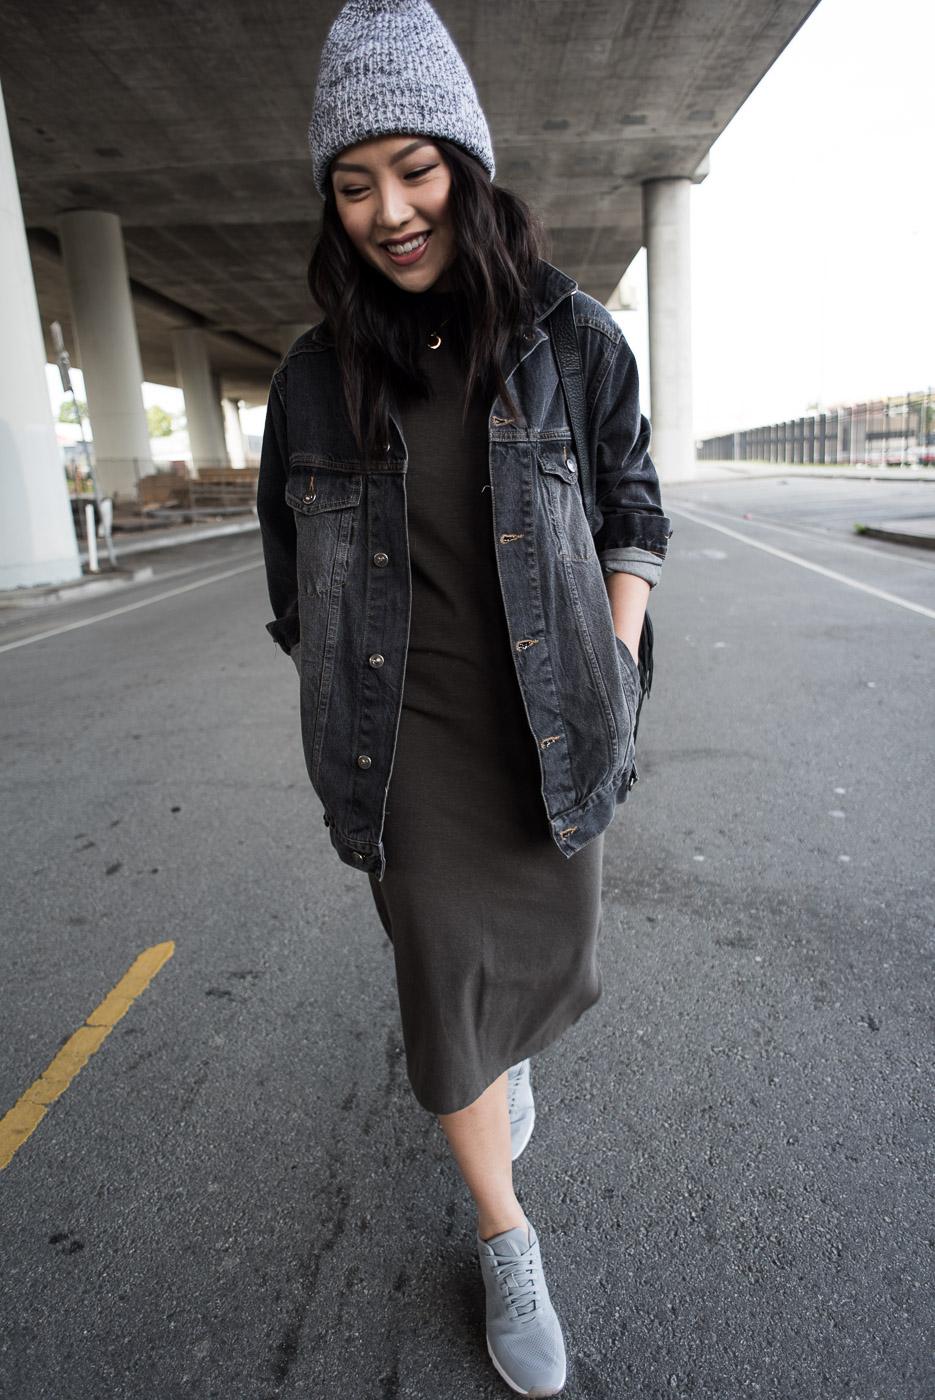 b0e17a7423d fall-outfit-idea-san-francisco-street-style-the- ...